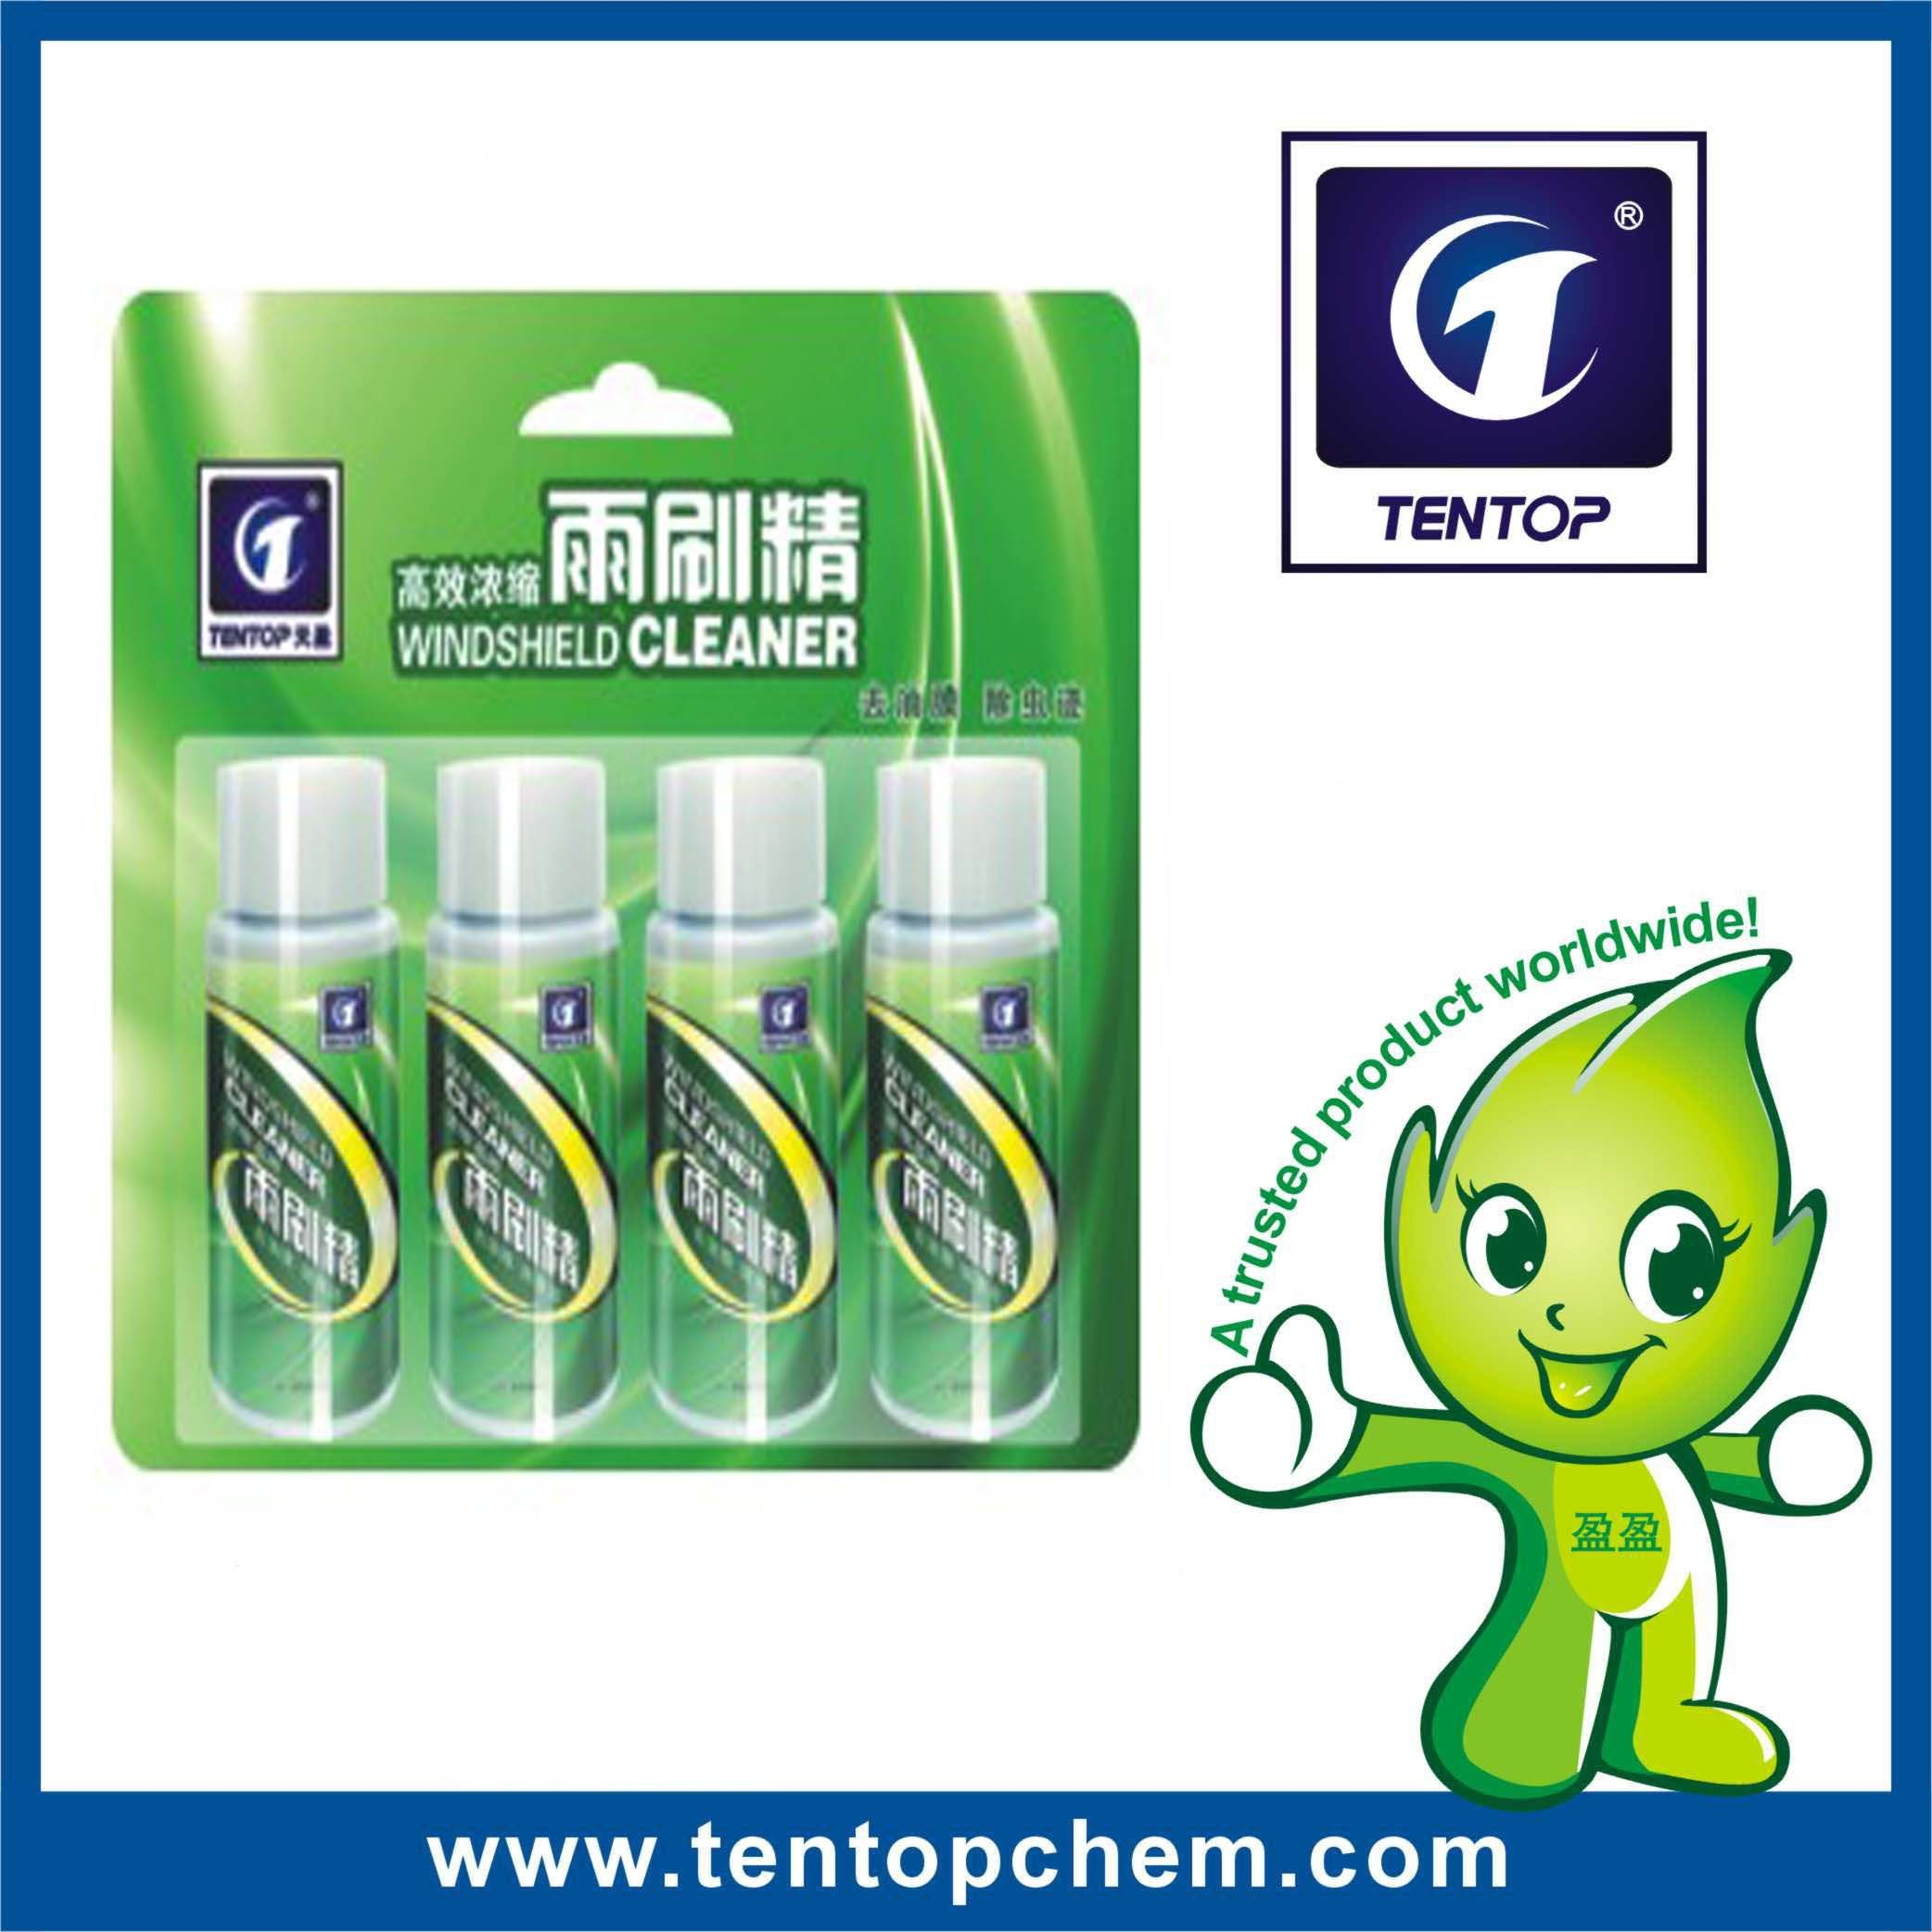 Windshield Cleaner (TT087)